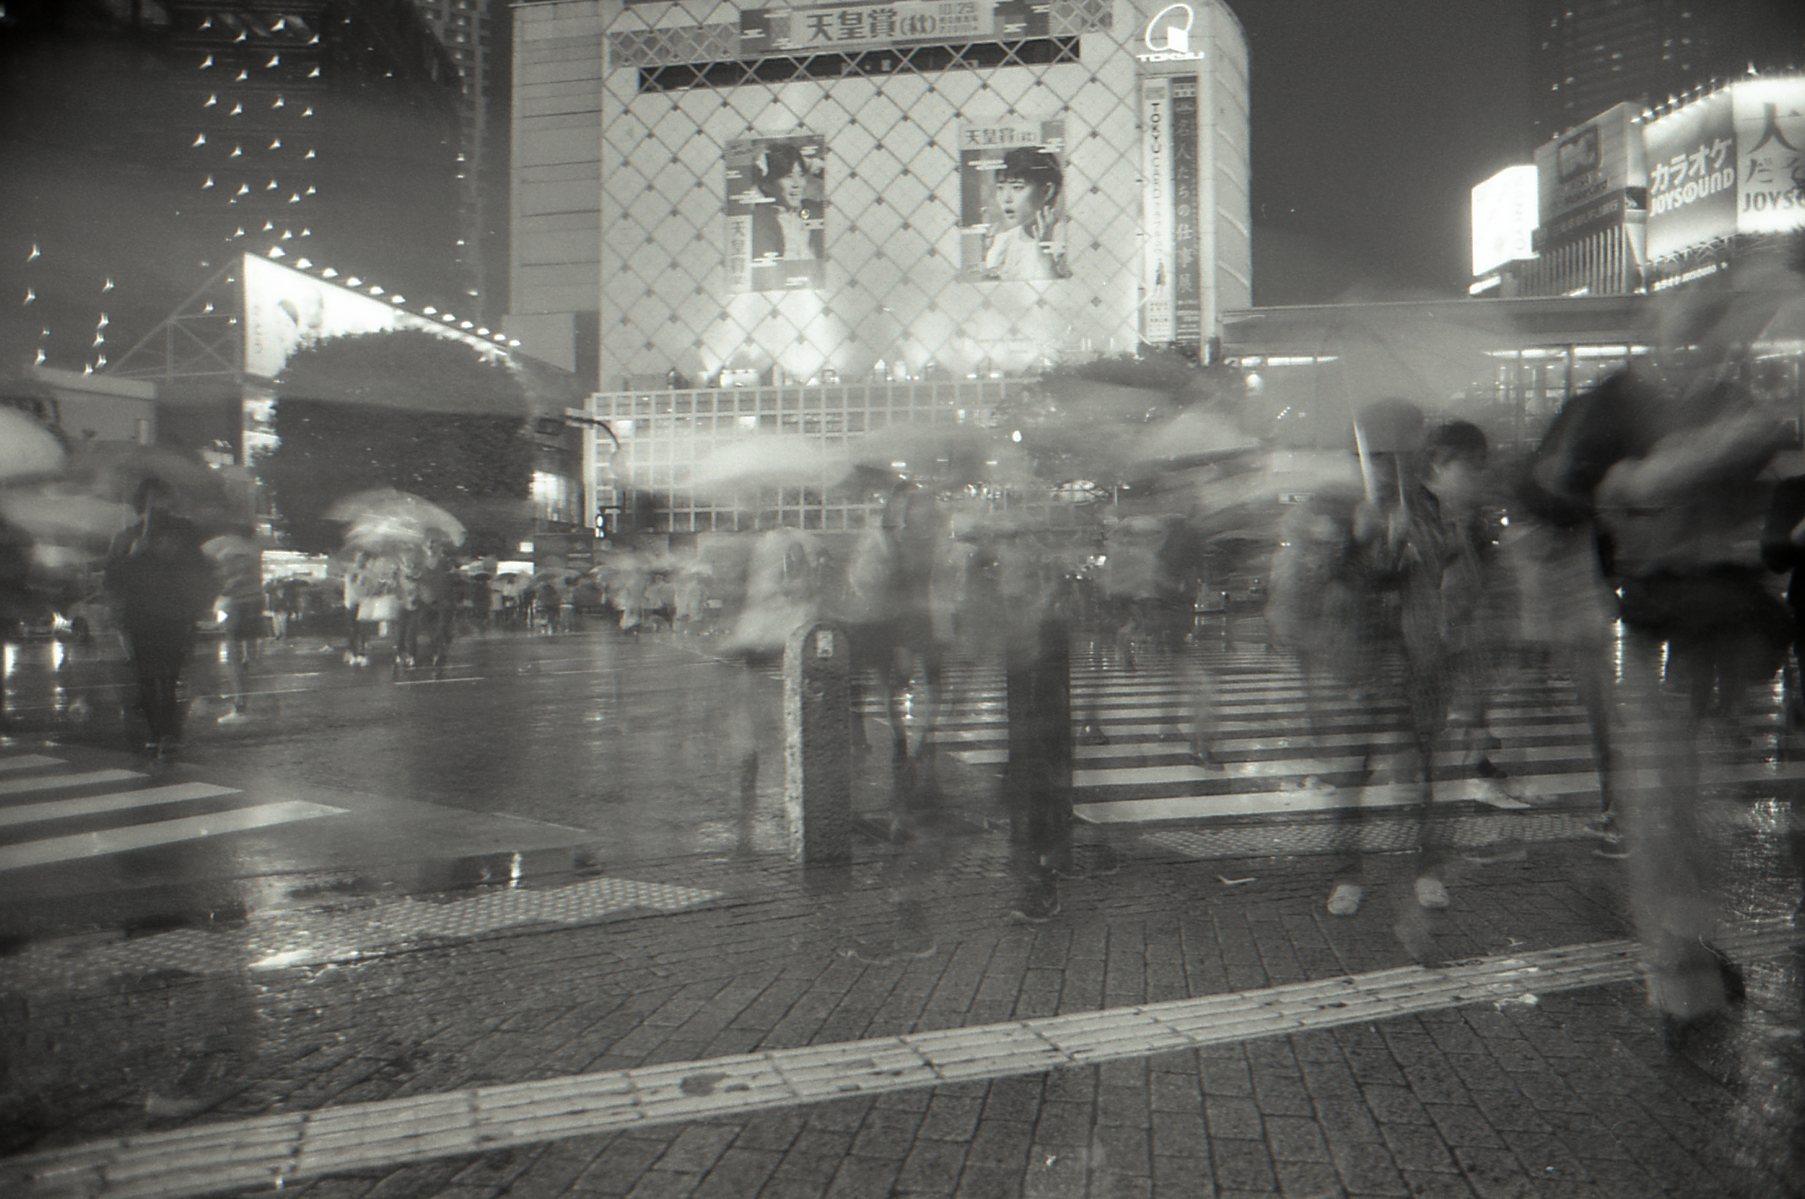 Tokyo, Japan - 2017